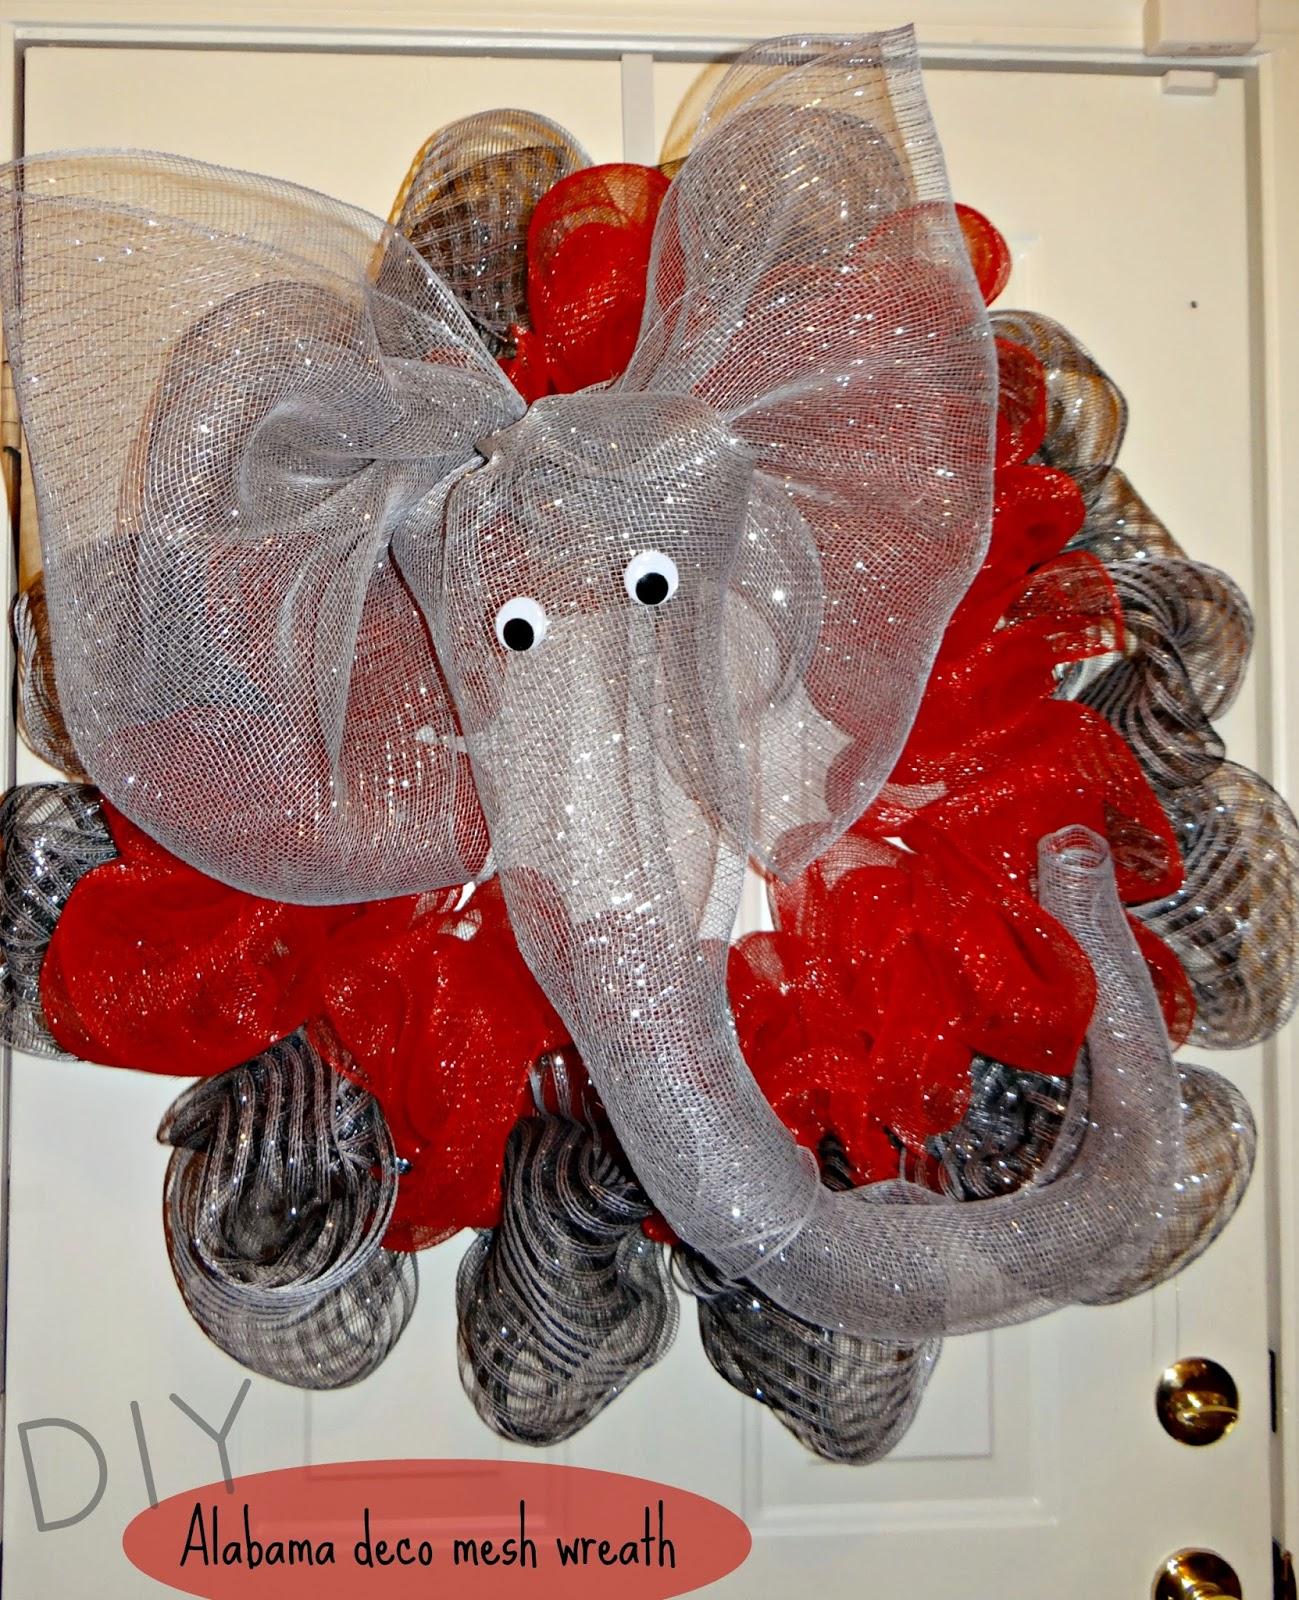 Creating Sunshine: DIY Alabama deco mesh wreath